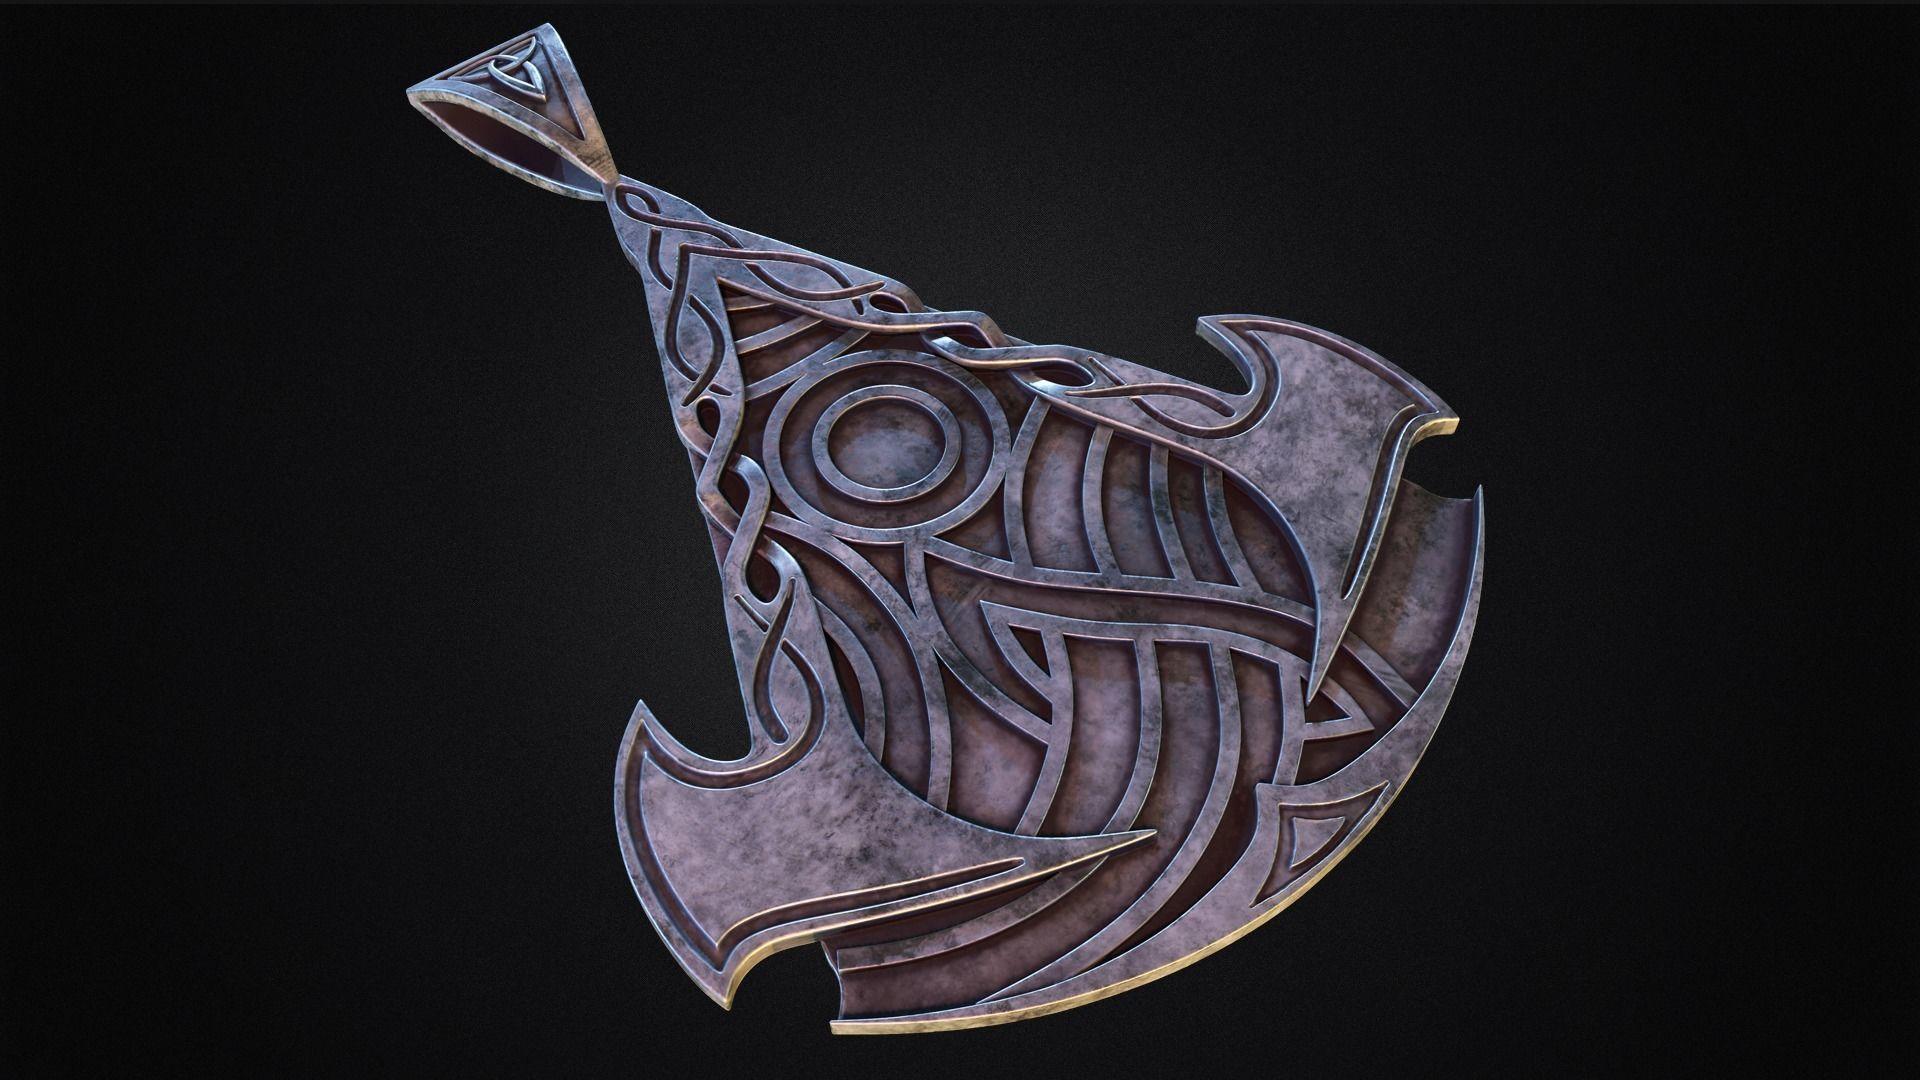 Assassins Creed Valhalla symbol Pendant - Necklace 3d model